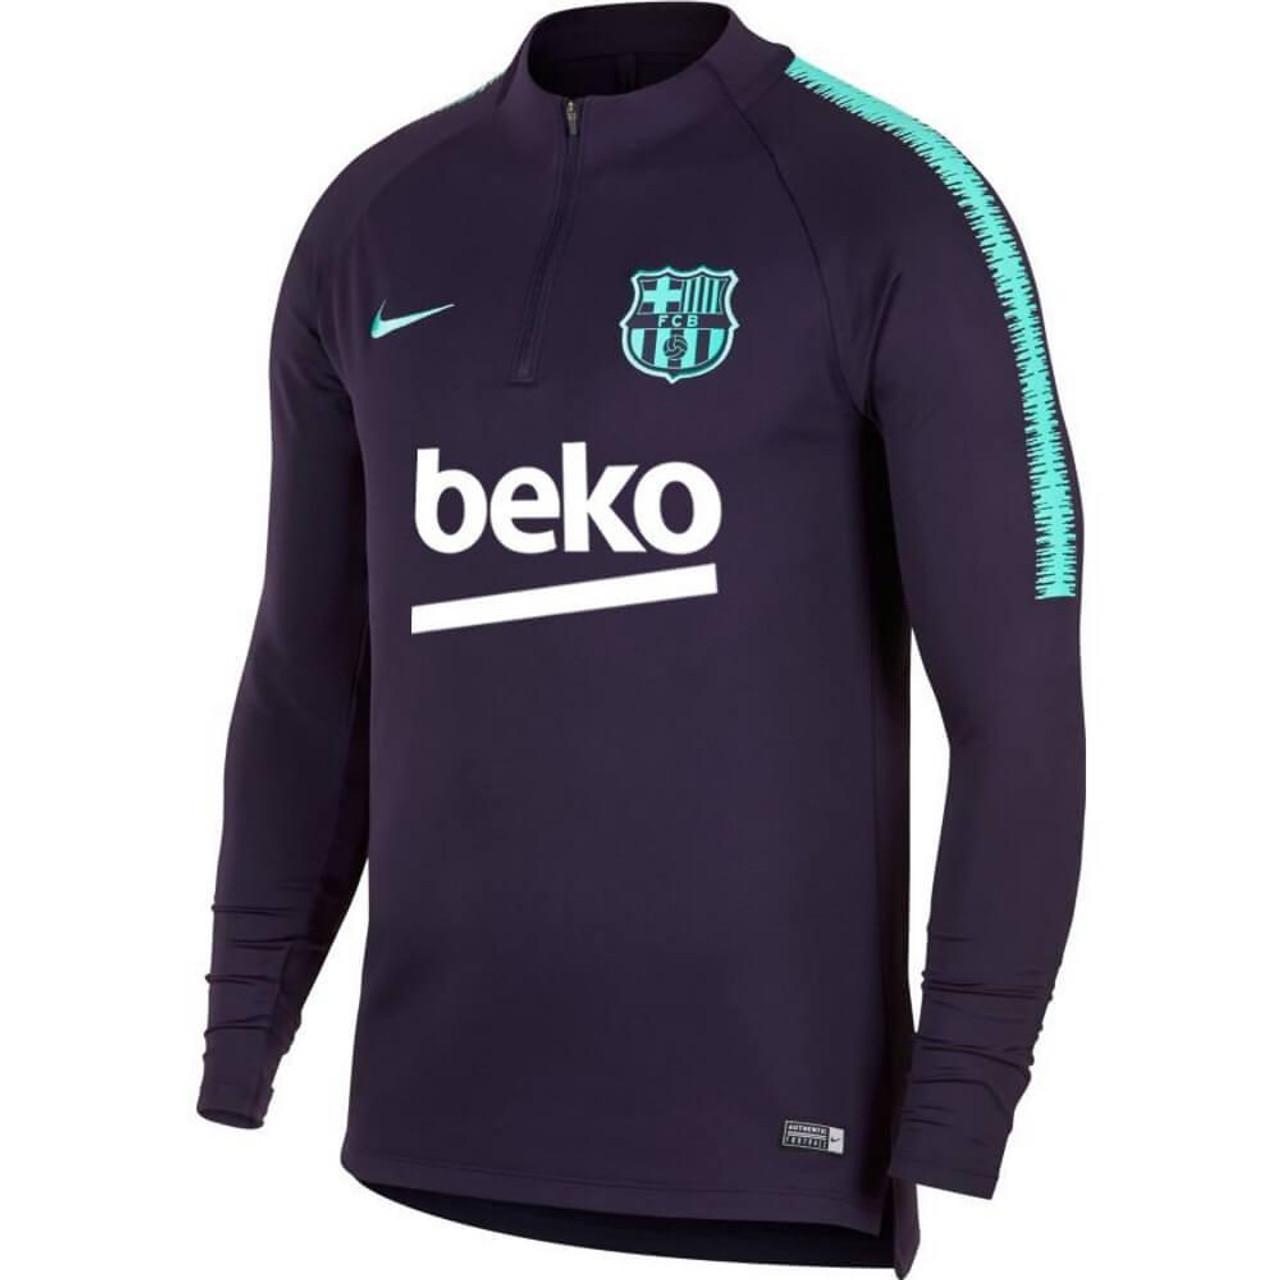 Mendigar cepillo ritmo  NIKE FC BARCELONA 2019 KIDS Dry Squad training top dynasty purple - Soccer  Plus